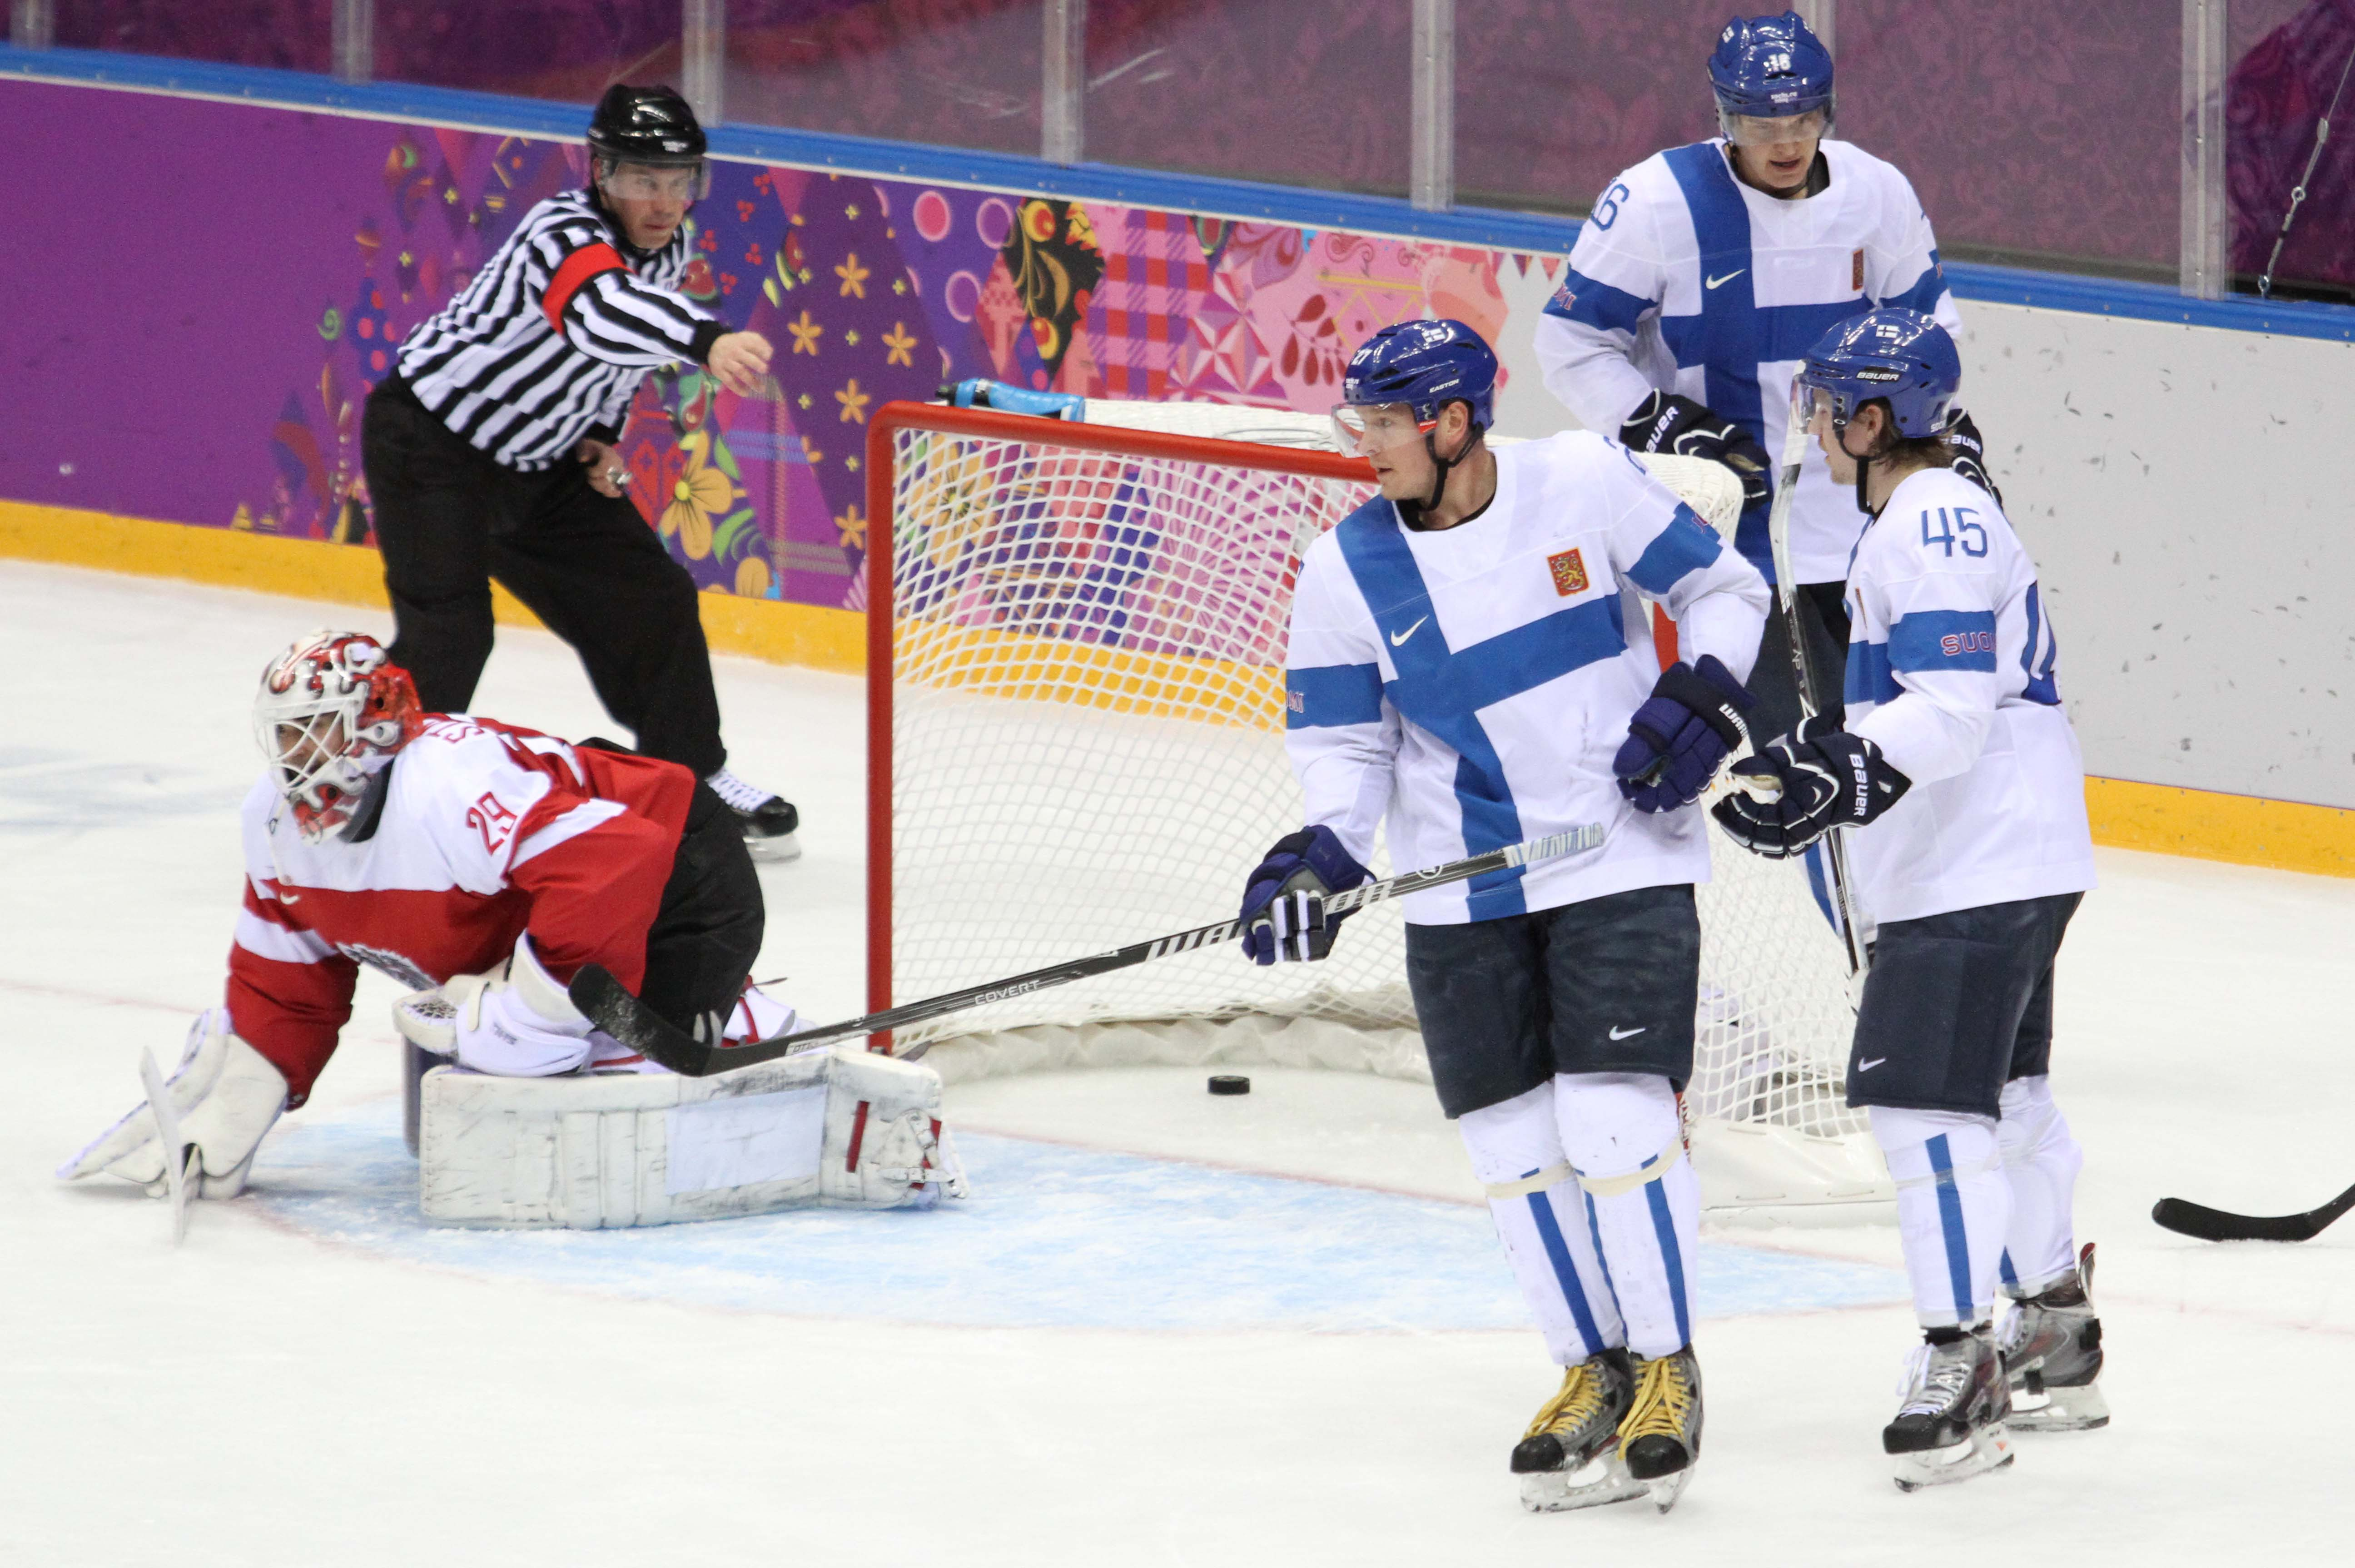 RUS, IIHF, Finnland vs Austria, 13.02.2014